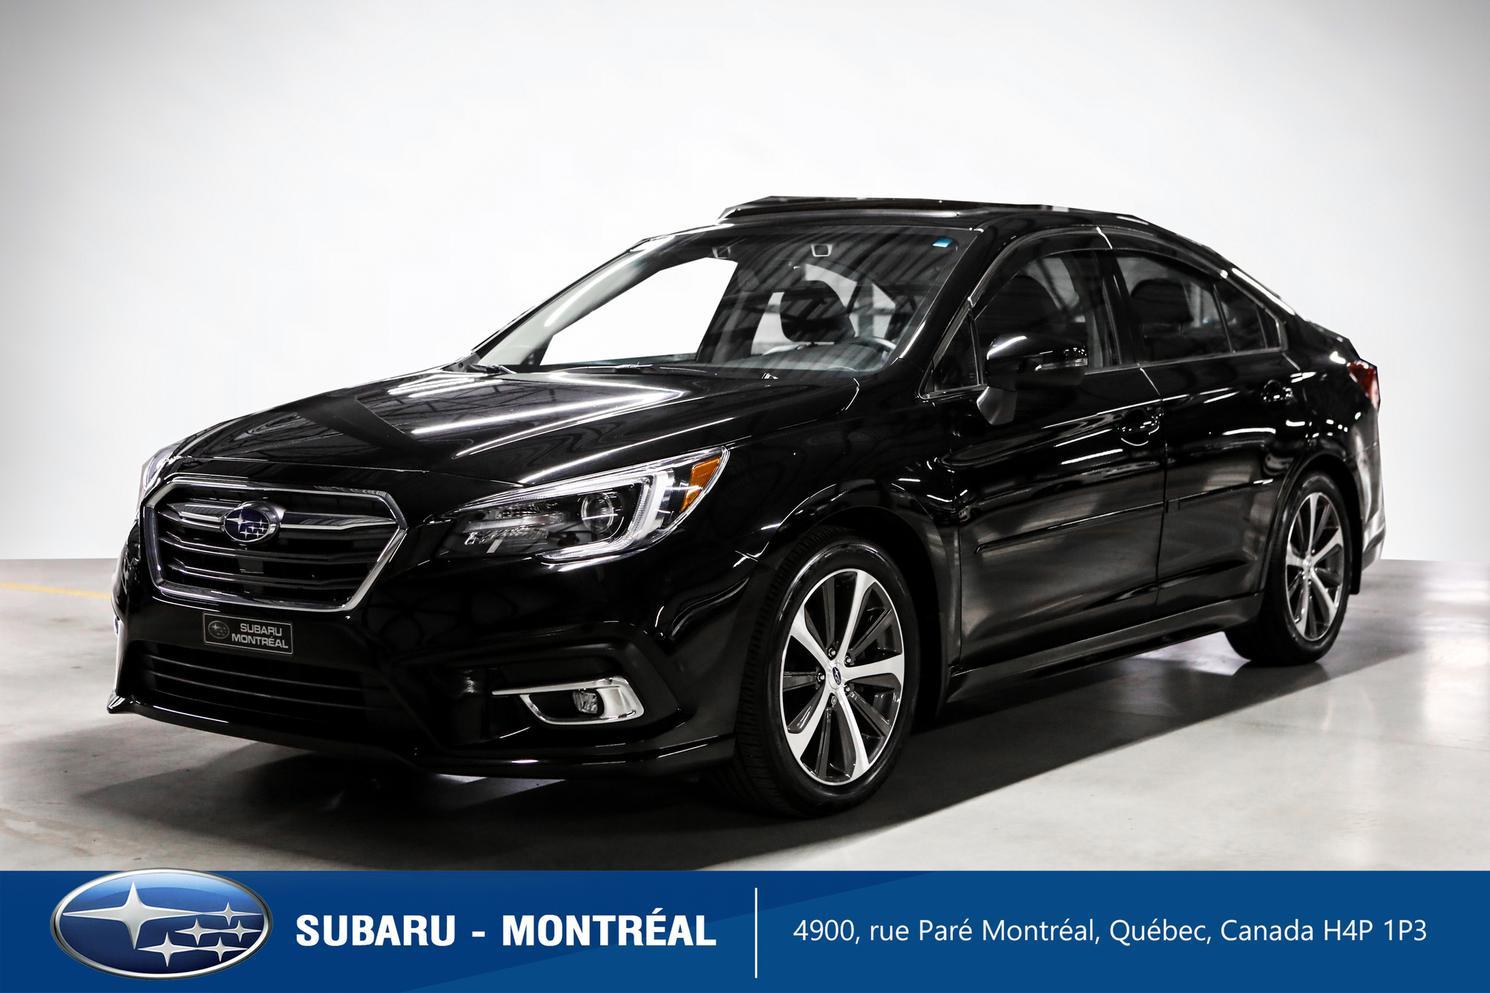 2019 Subaru Legacy Limited EyeSight